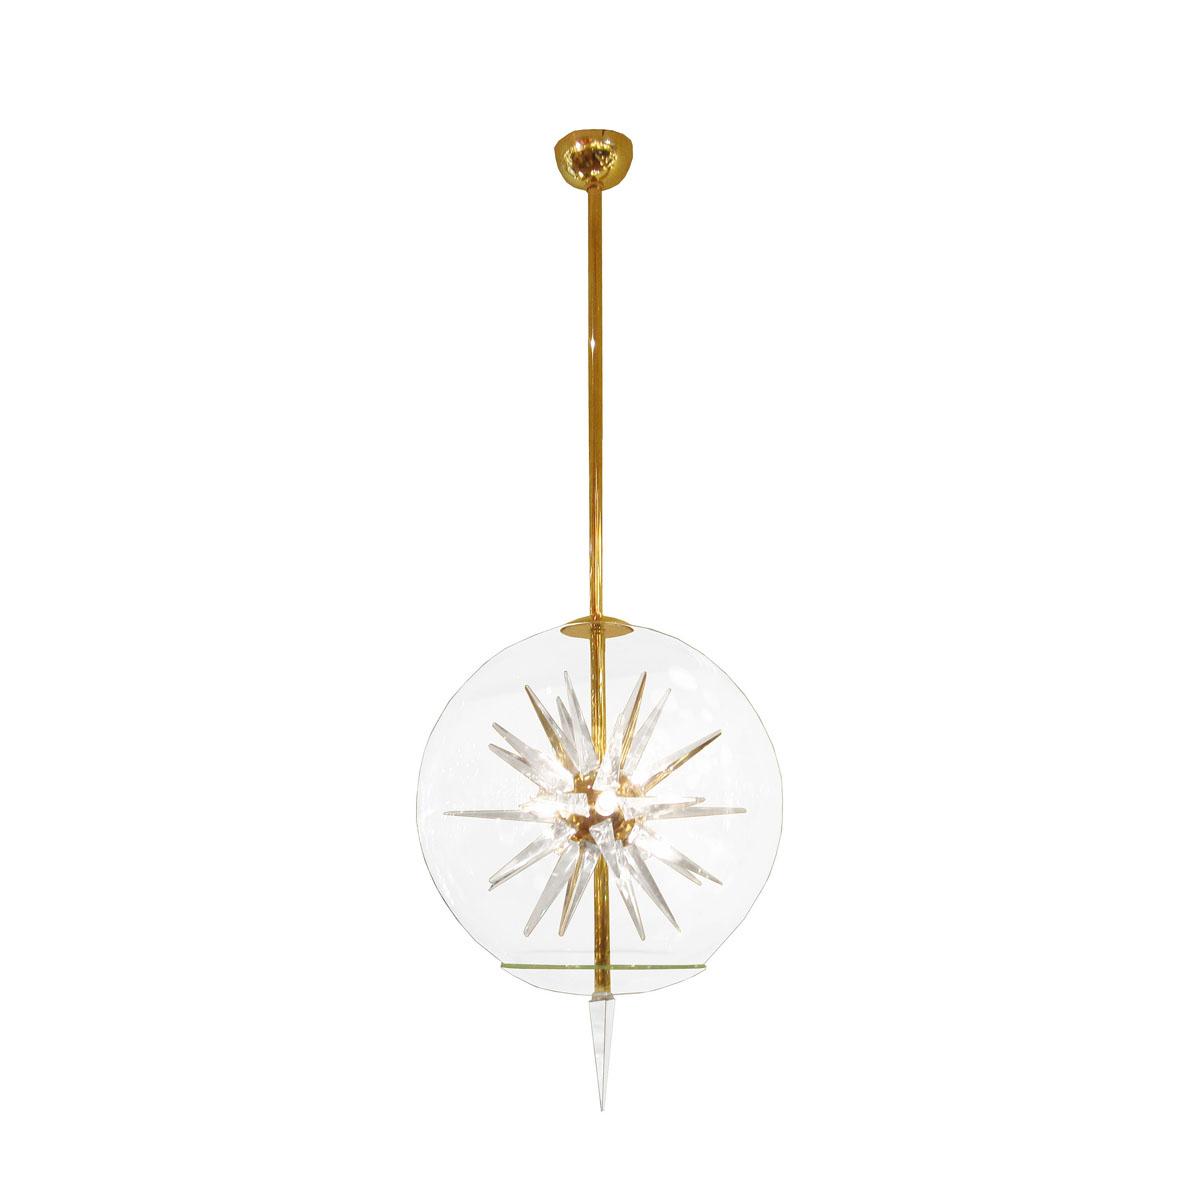 Spherical glass pendant with internal starburst prism